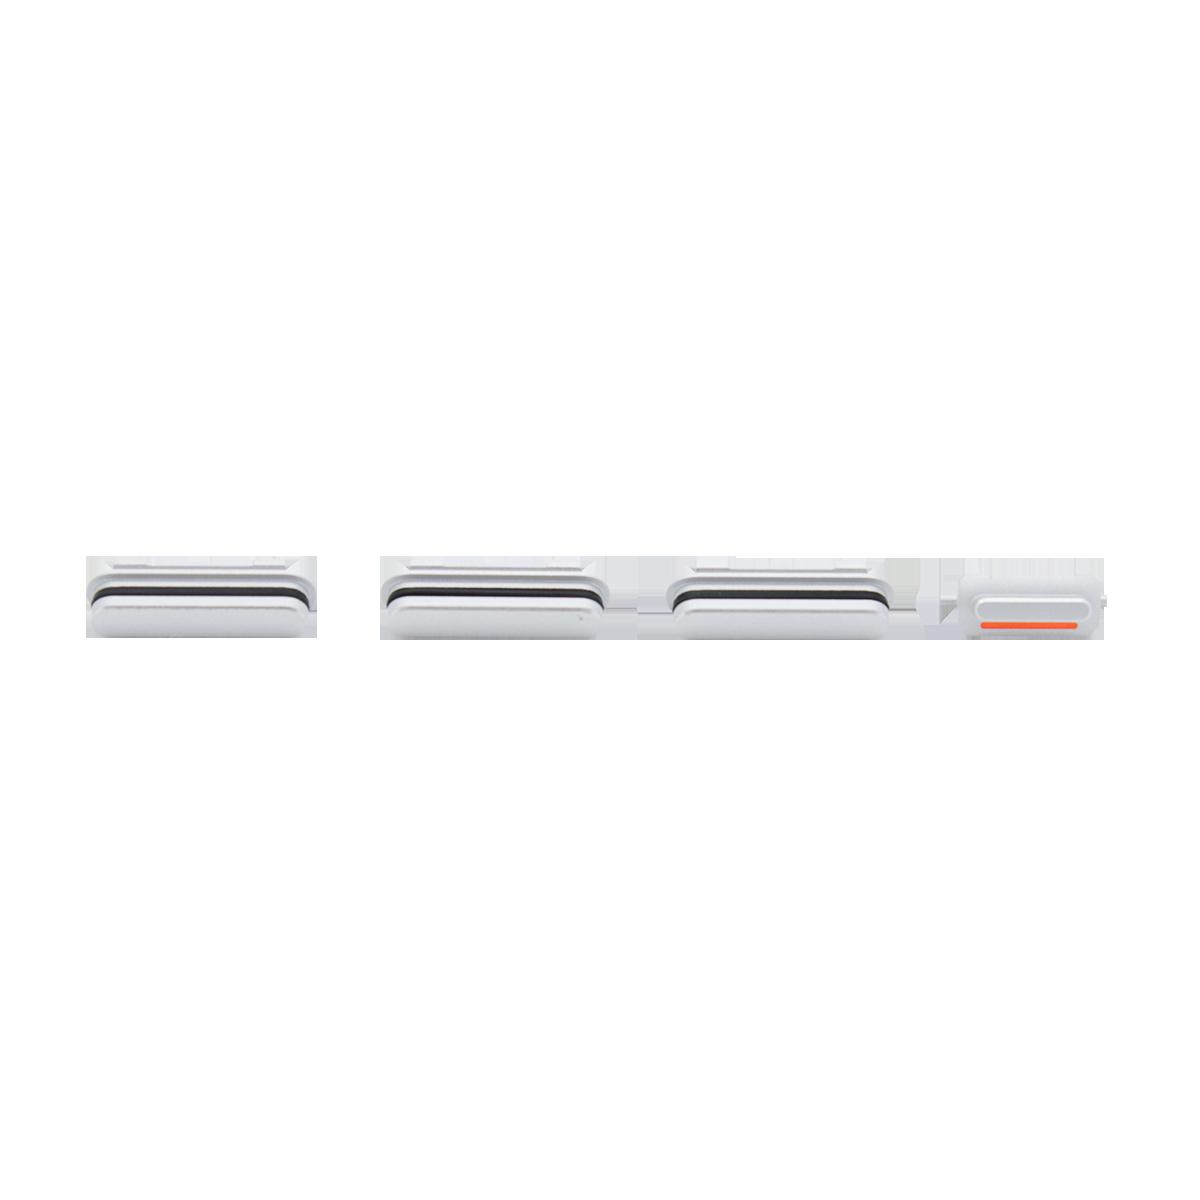 אייפון 6S ערכת ברגים - זהב